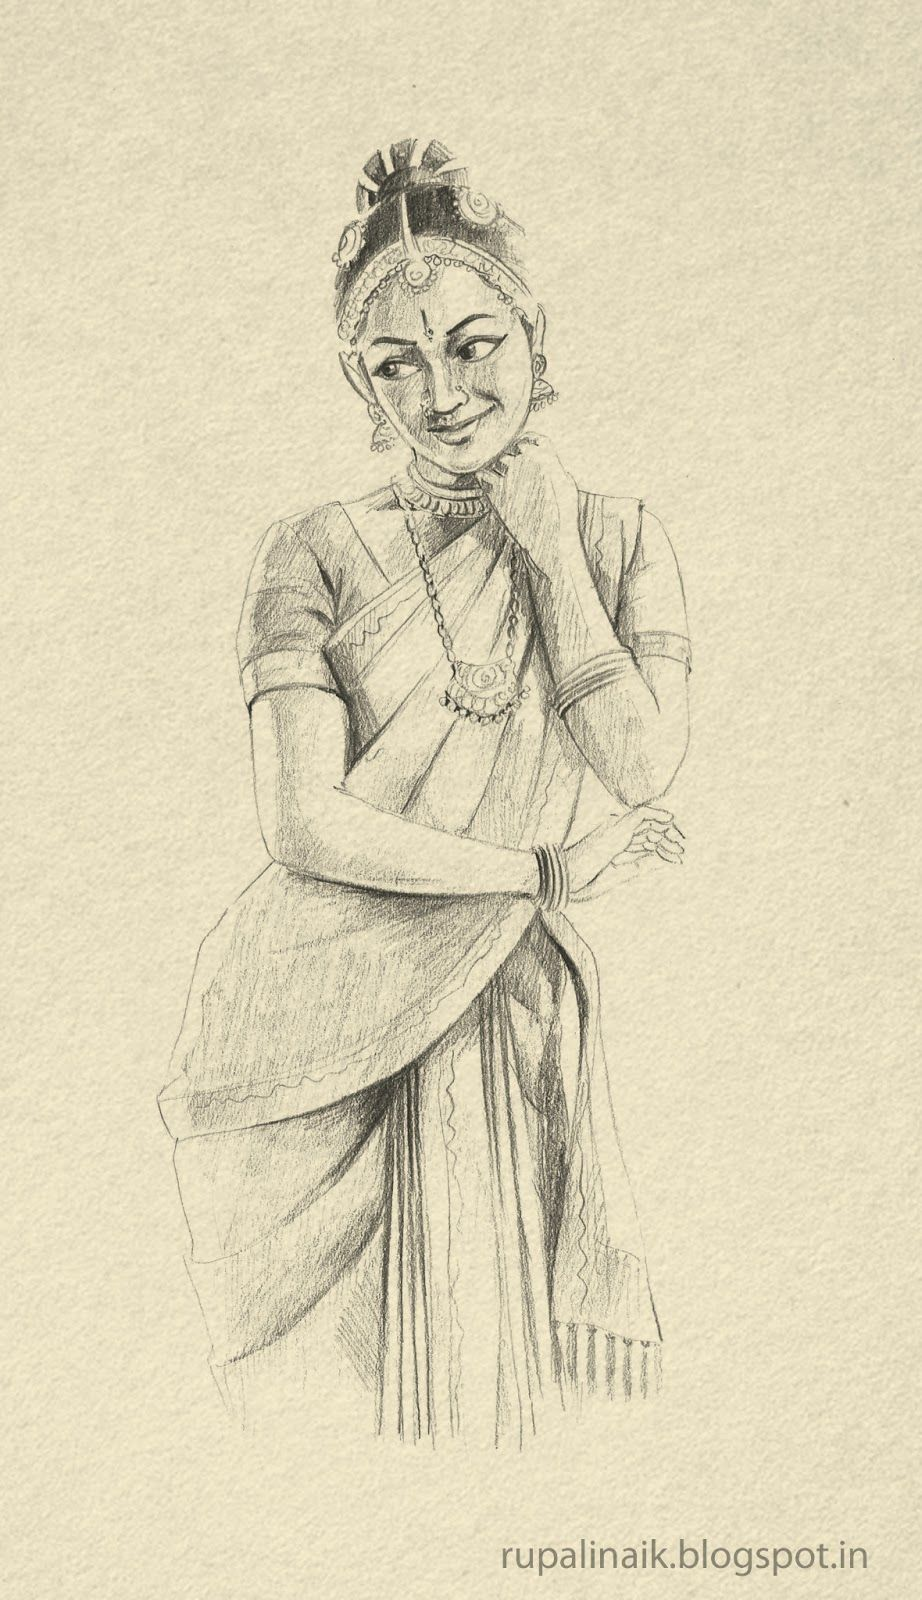 Sketch painting drawing sketches pencil drawings pencil shading pencil art art